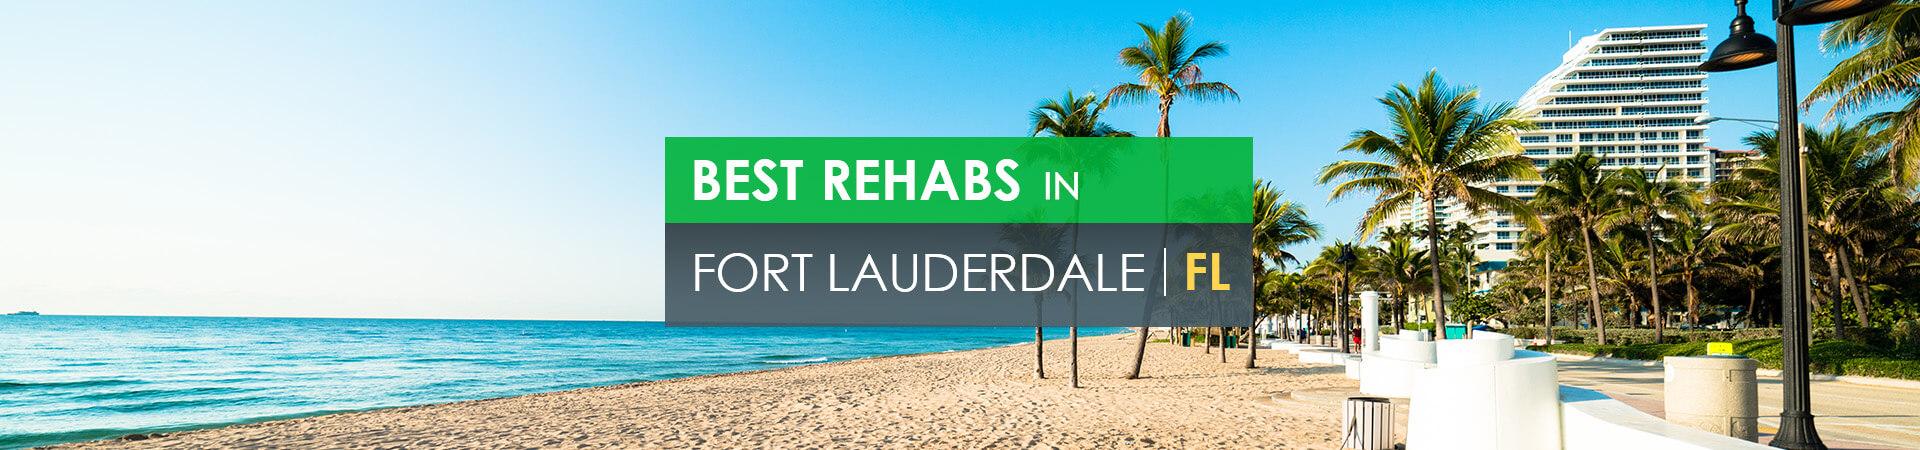 Best rehabs in Fort Lauderdale, FL